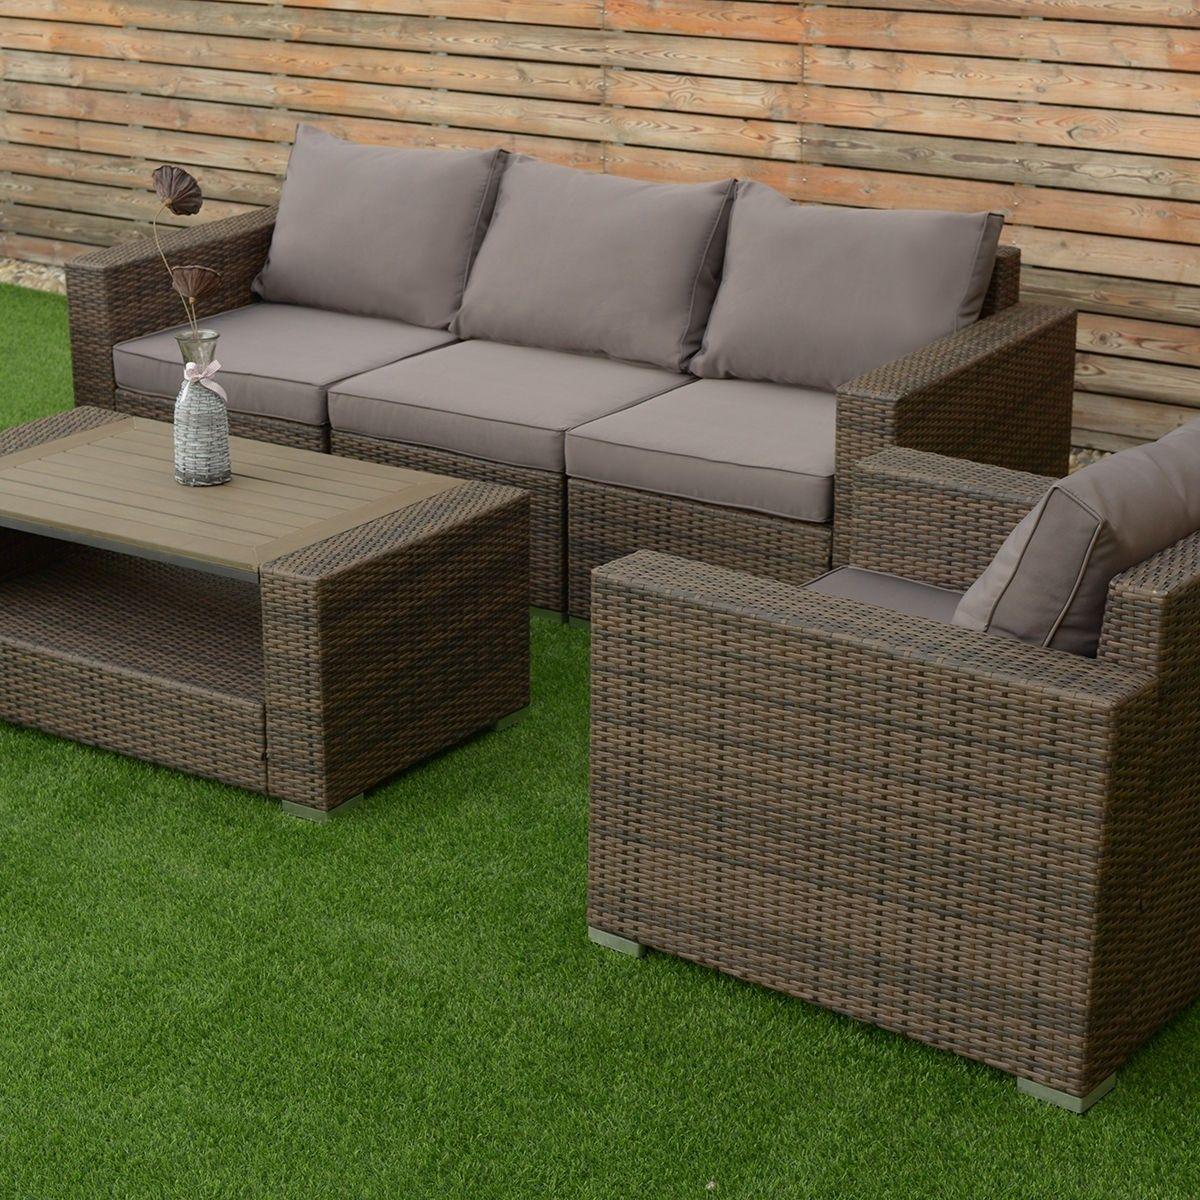 7 pcs Patio Rattan Sectional Aluminum Frame Furniture Set | 7 pcs ...